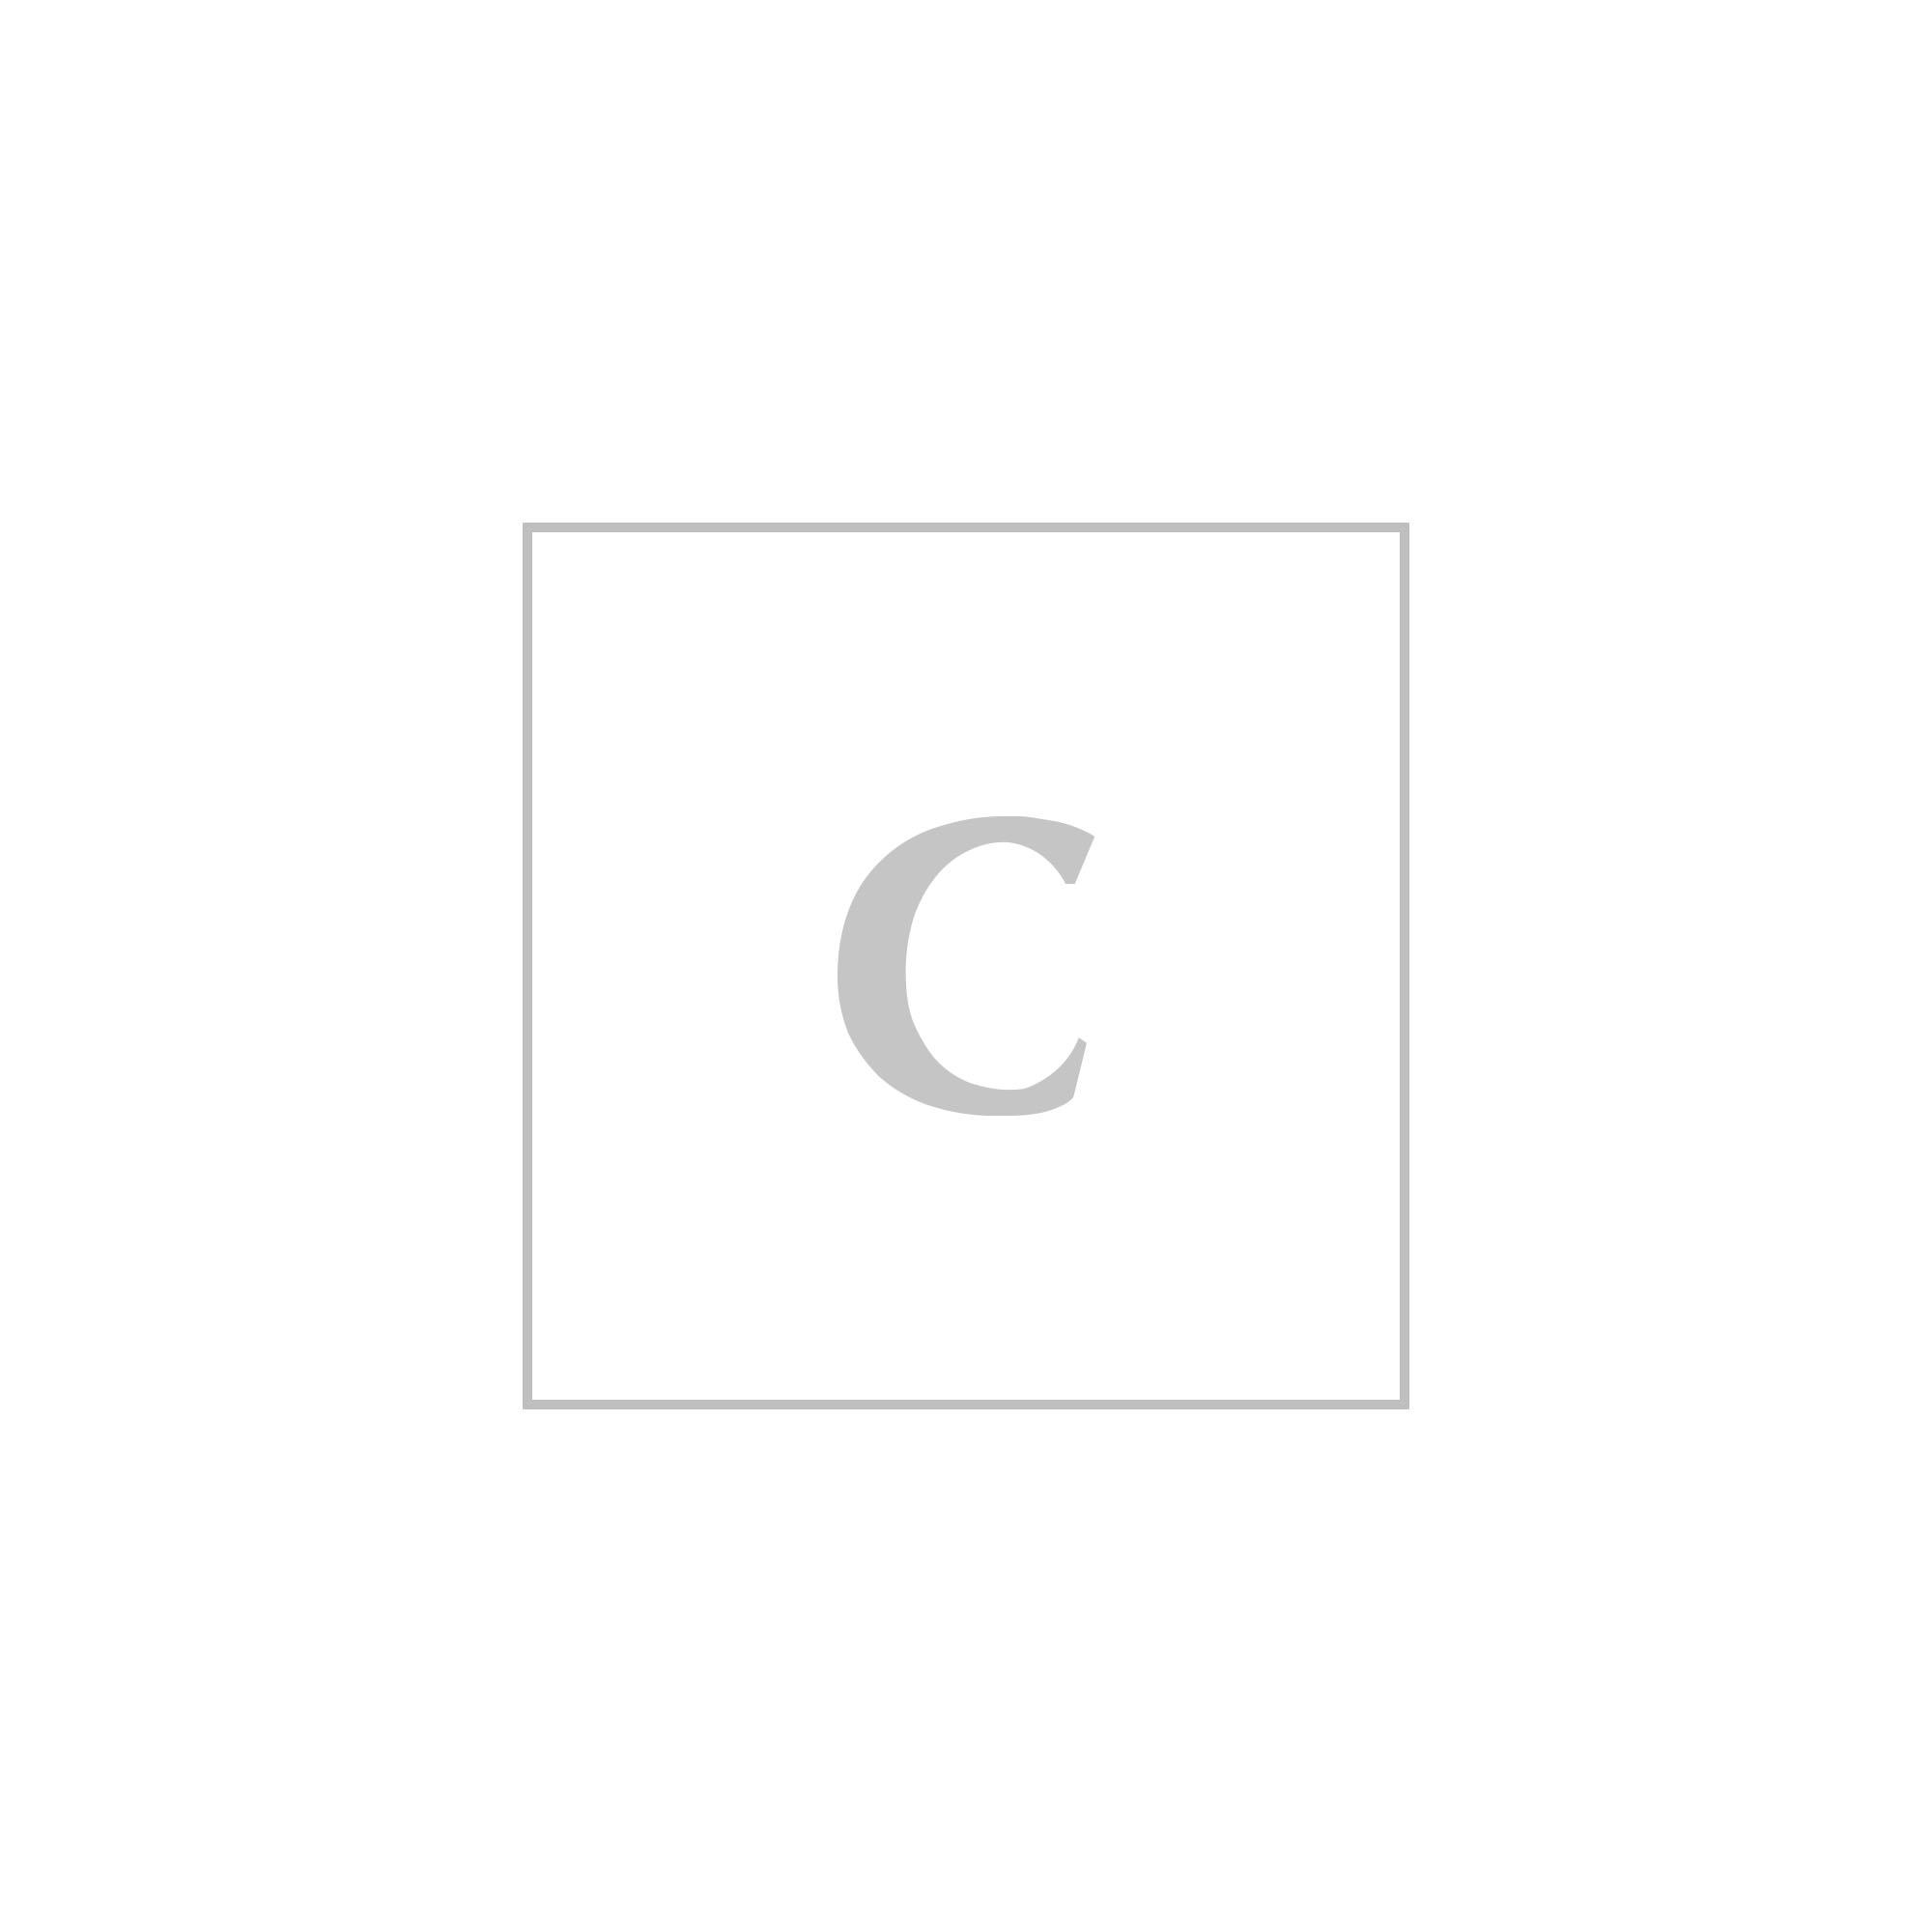 Dolce & gabbana triangolo scorrevole